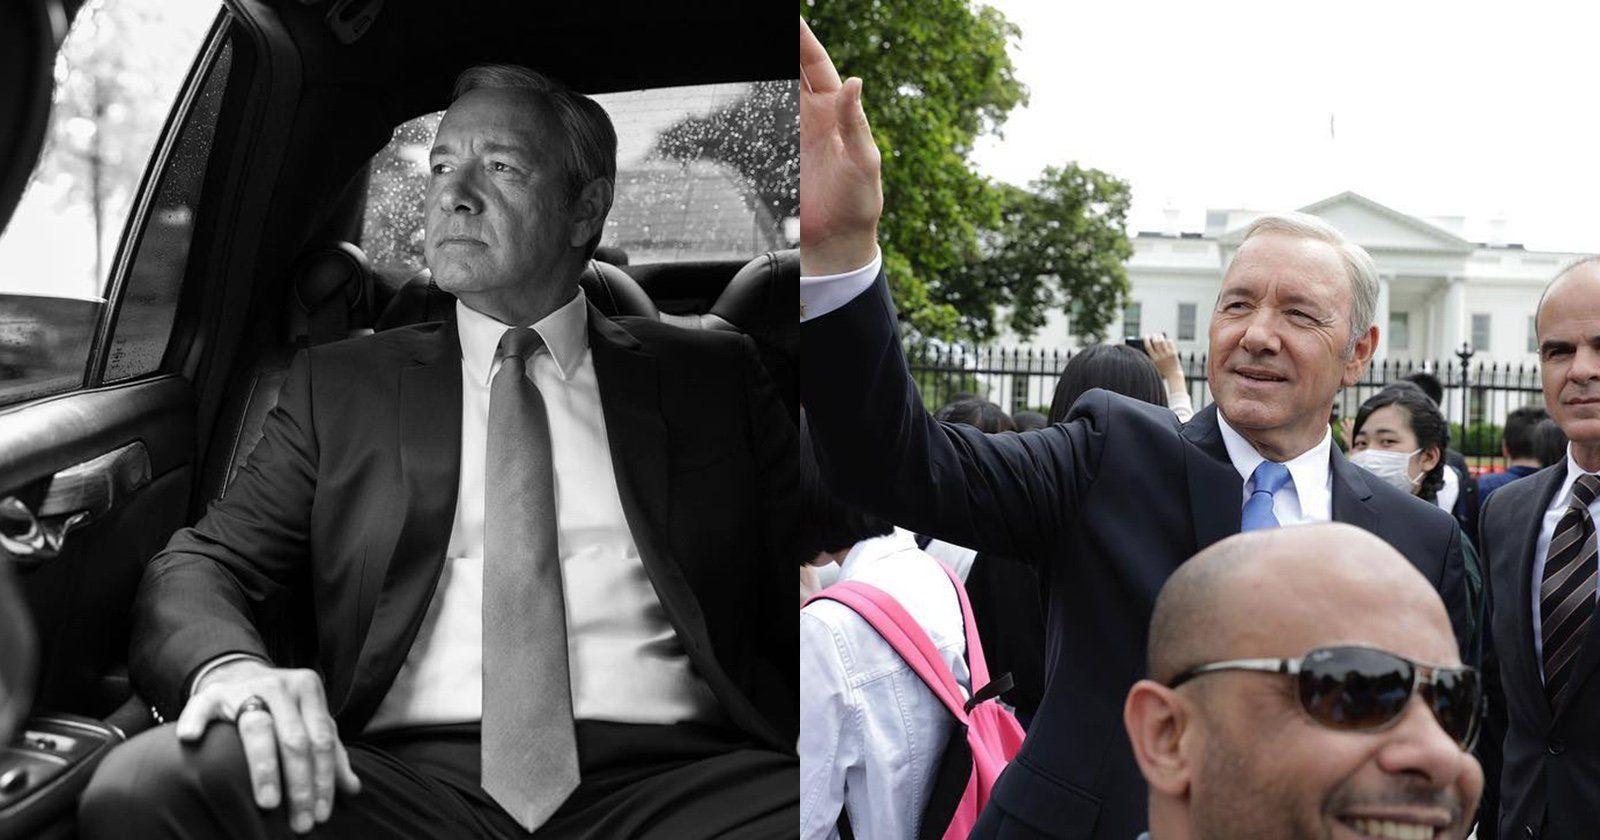 White House Photographer Pete Souza Shoots President Frank Underwood Frank Underwood Blog Photography Photographer